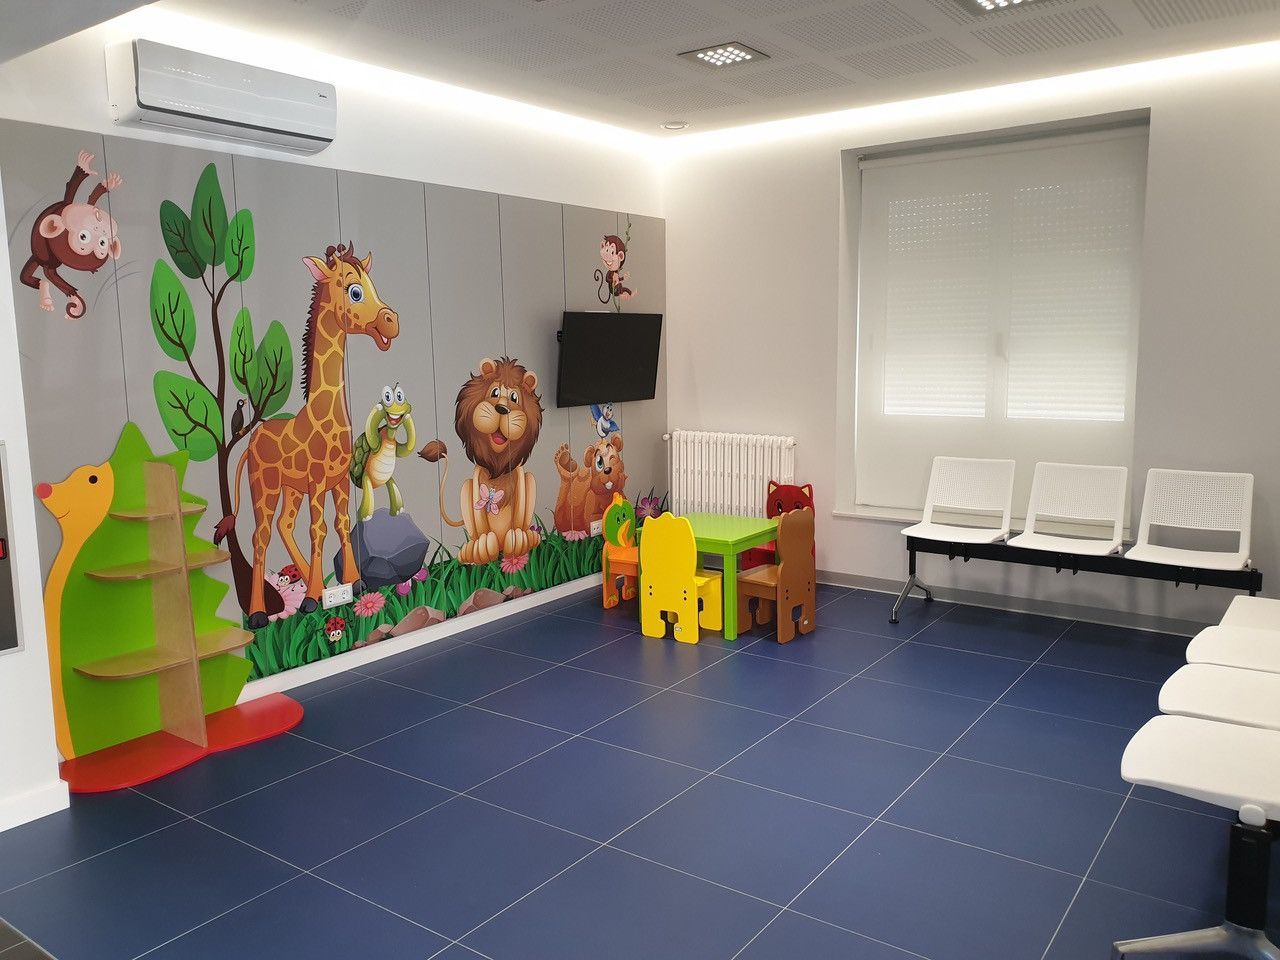 Sala de espera pediatru00eda policlinicas